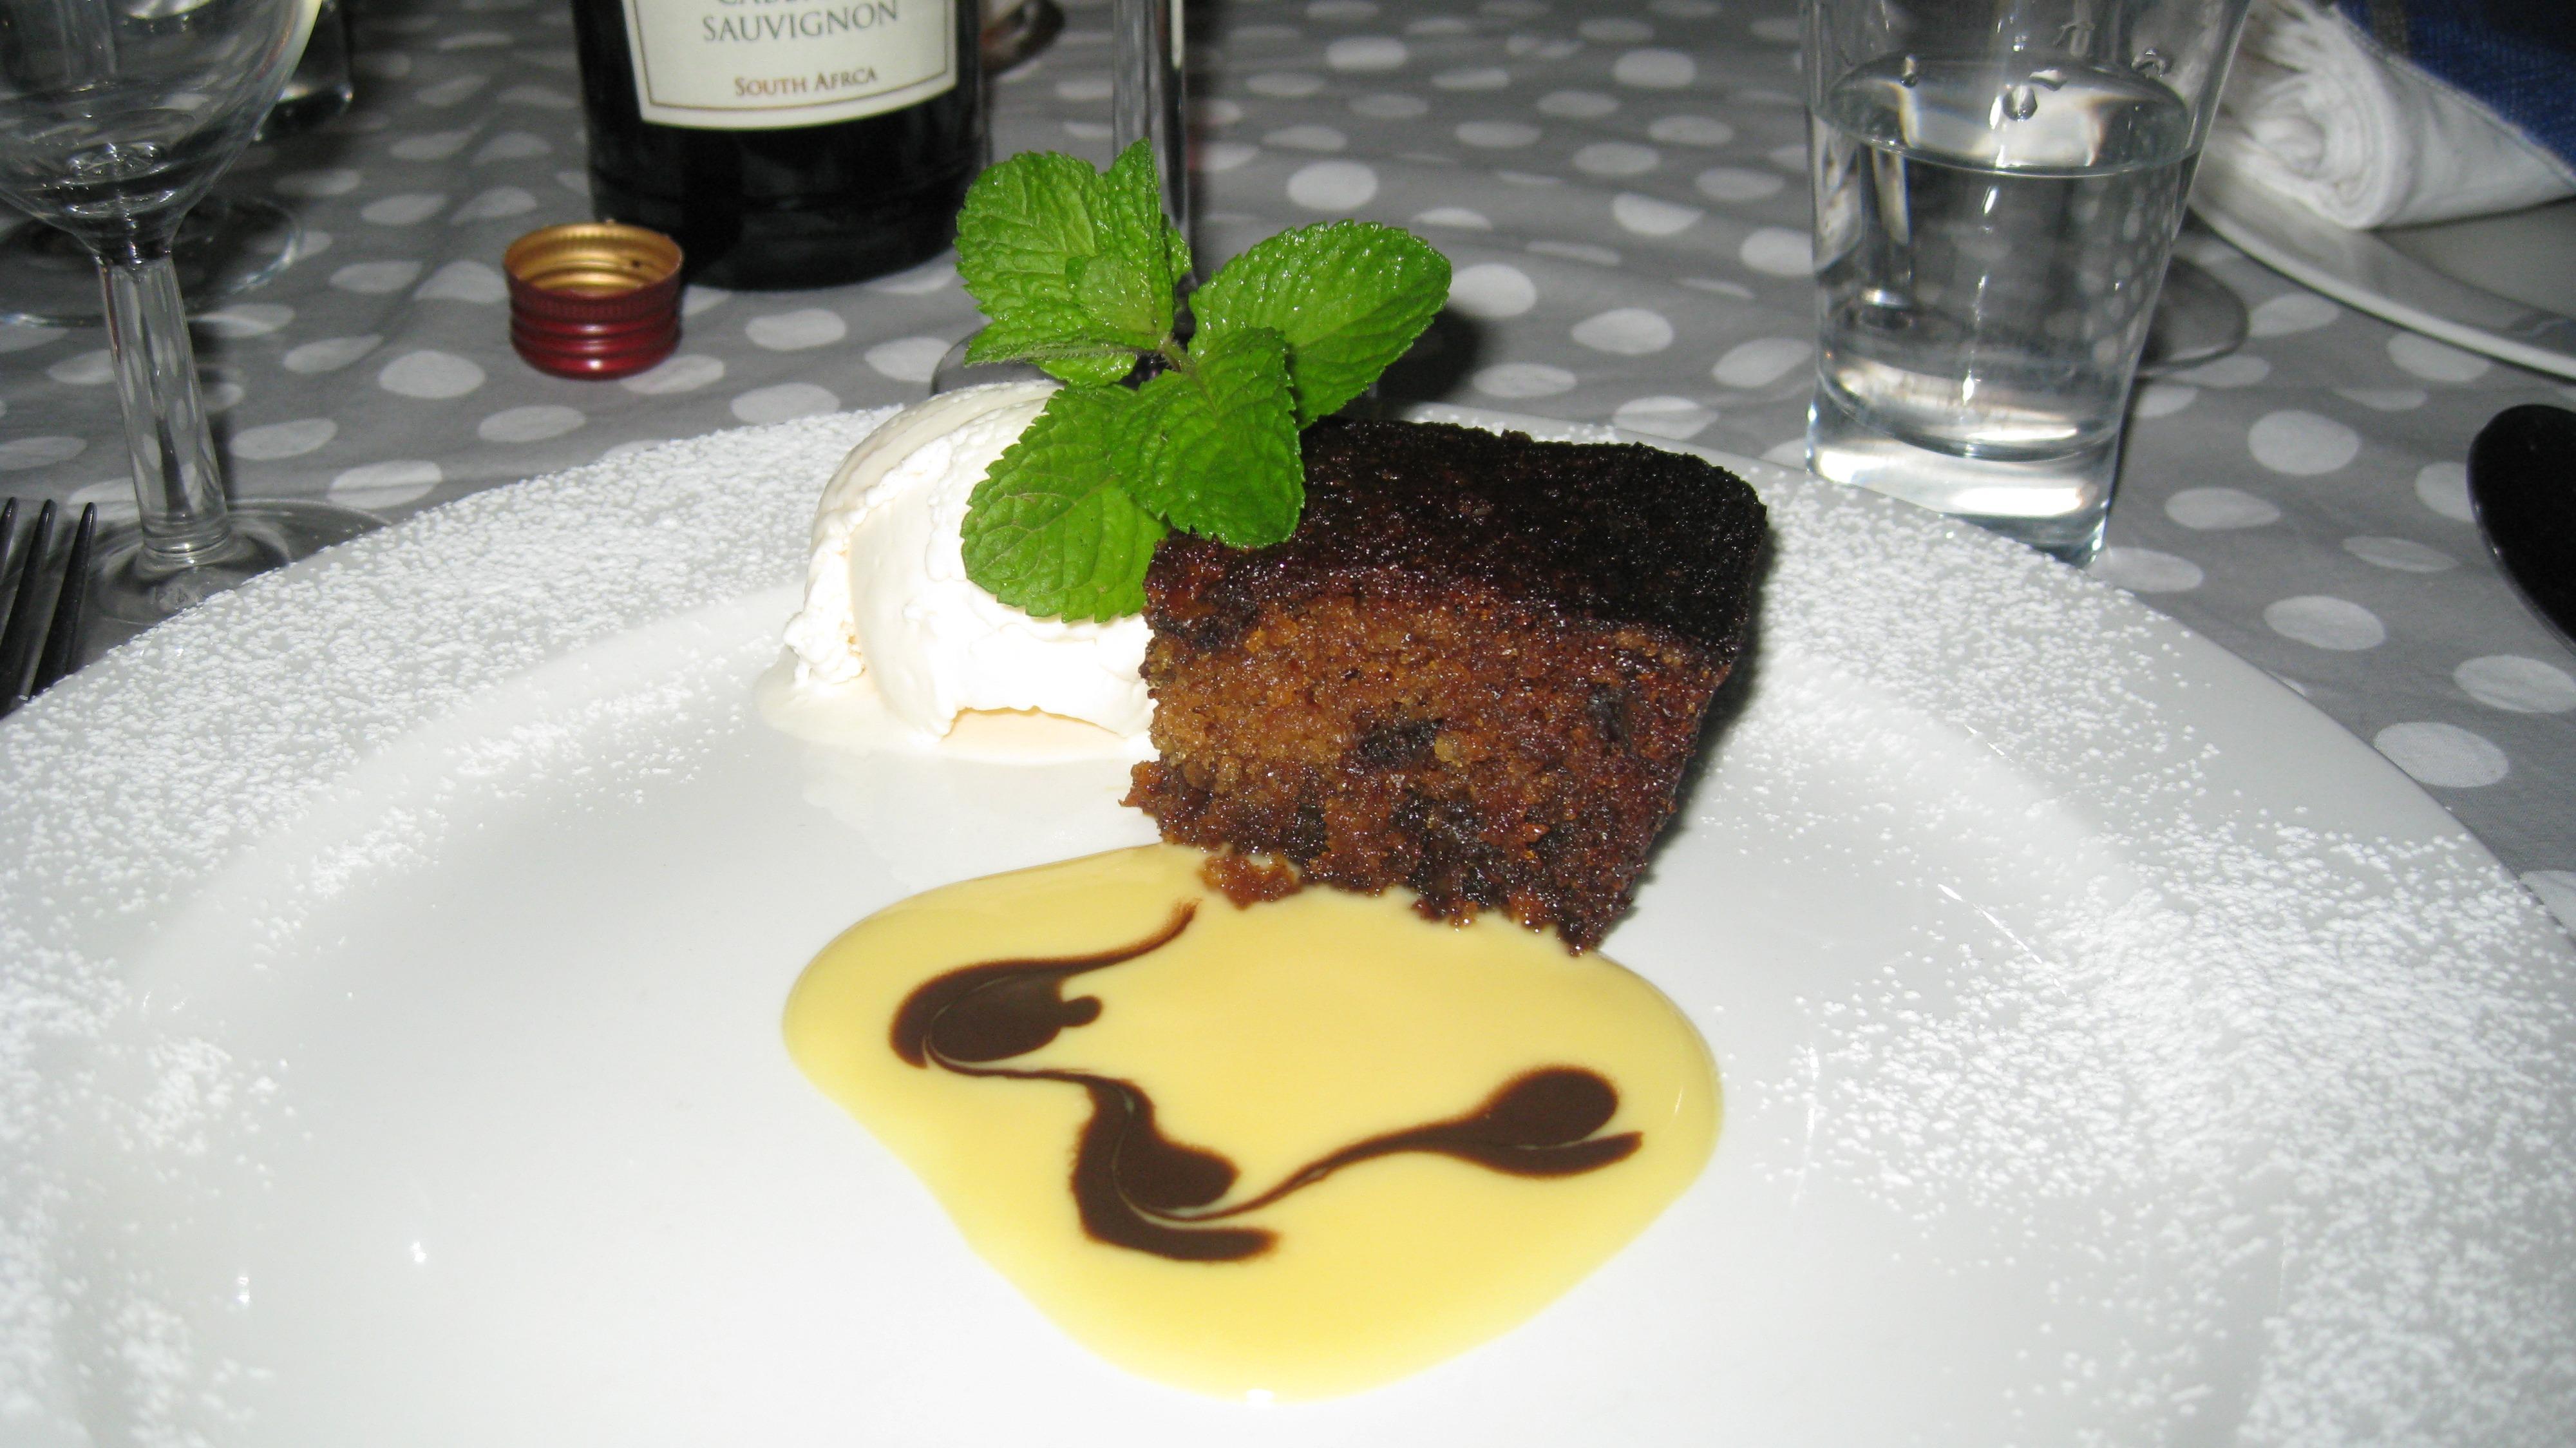 Gratis billeder : sød, restaurant, måltid, mad, plade, chokolade ...